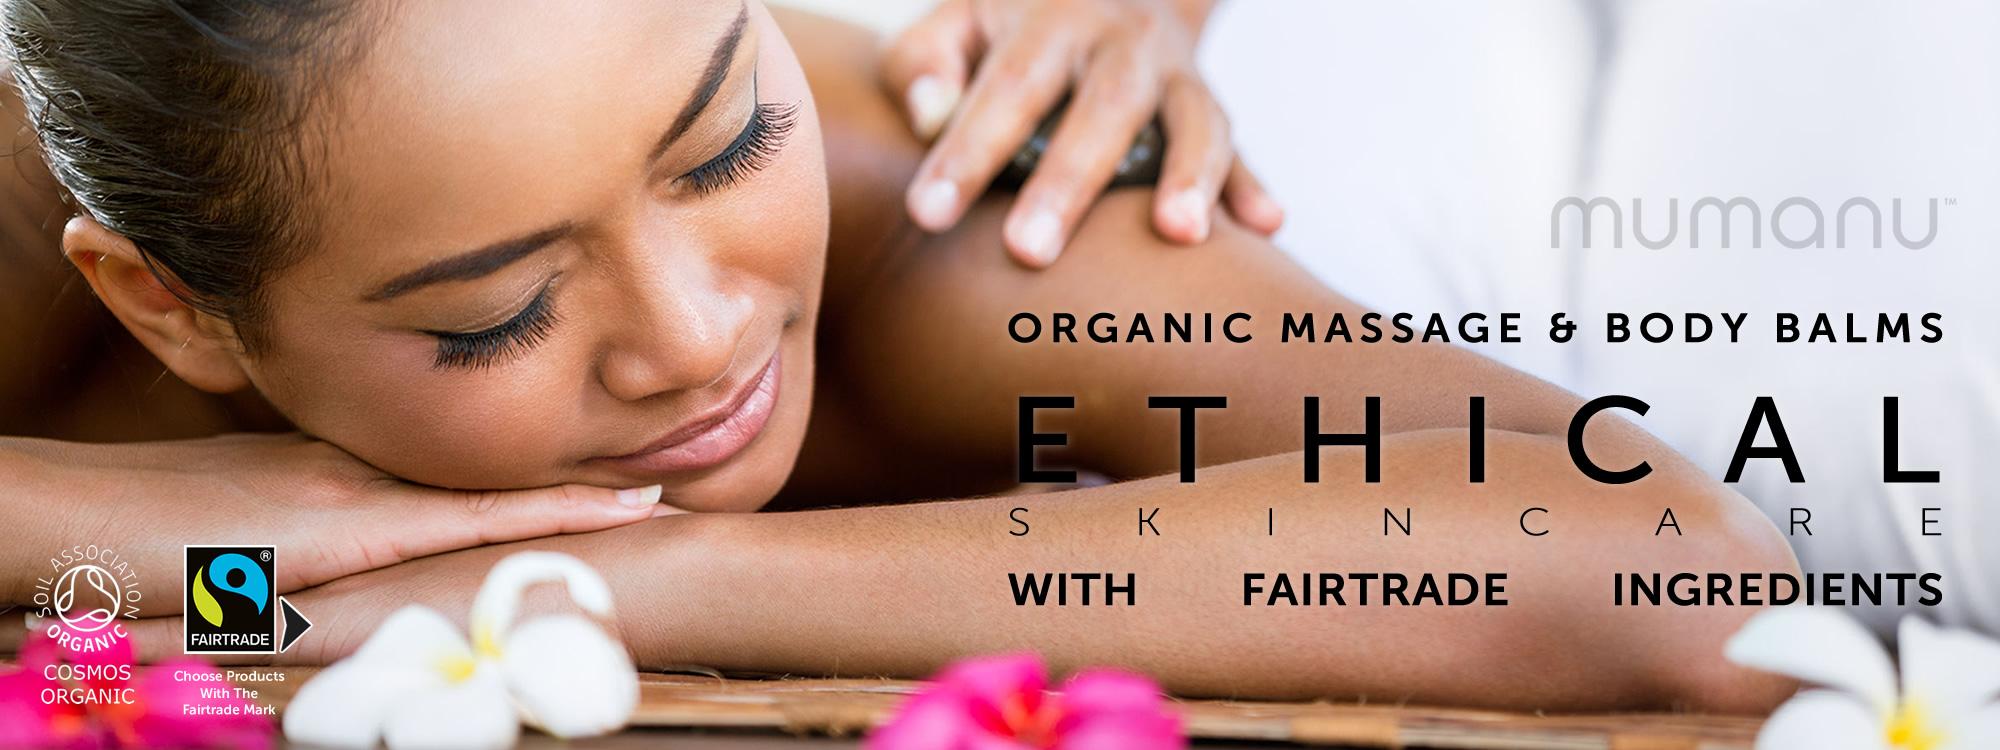 Mumanu Organic Massage Oil & Shea Moisturiser With Fairtrade Ingredients